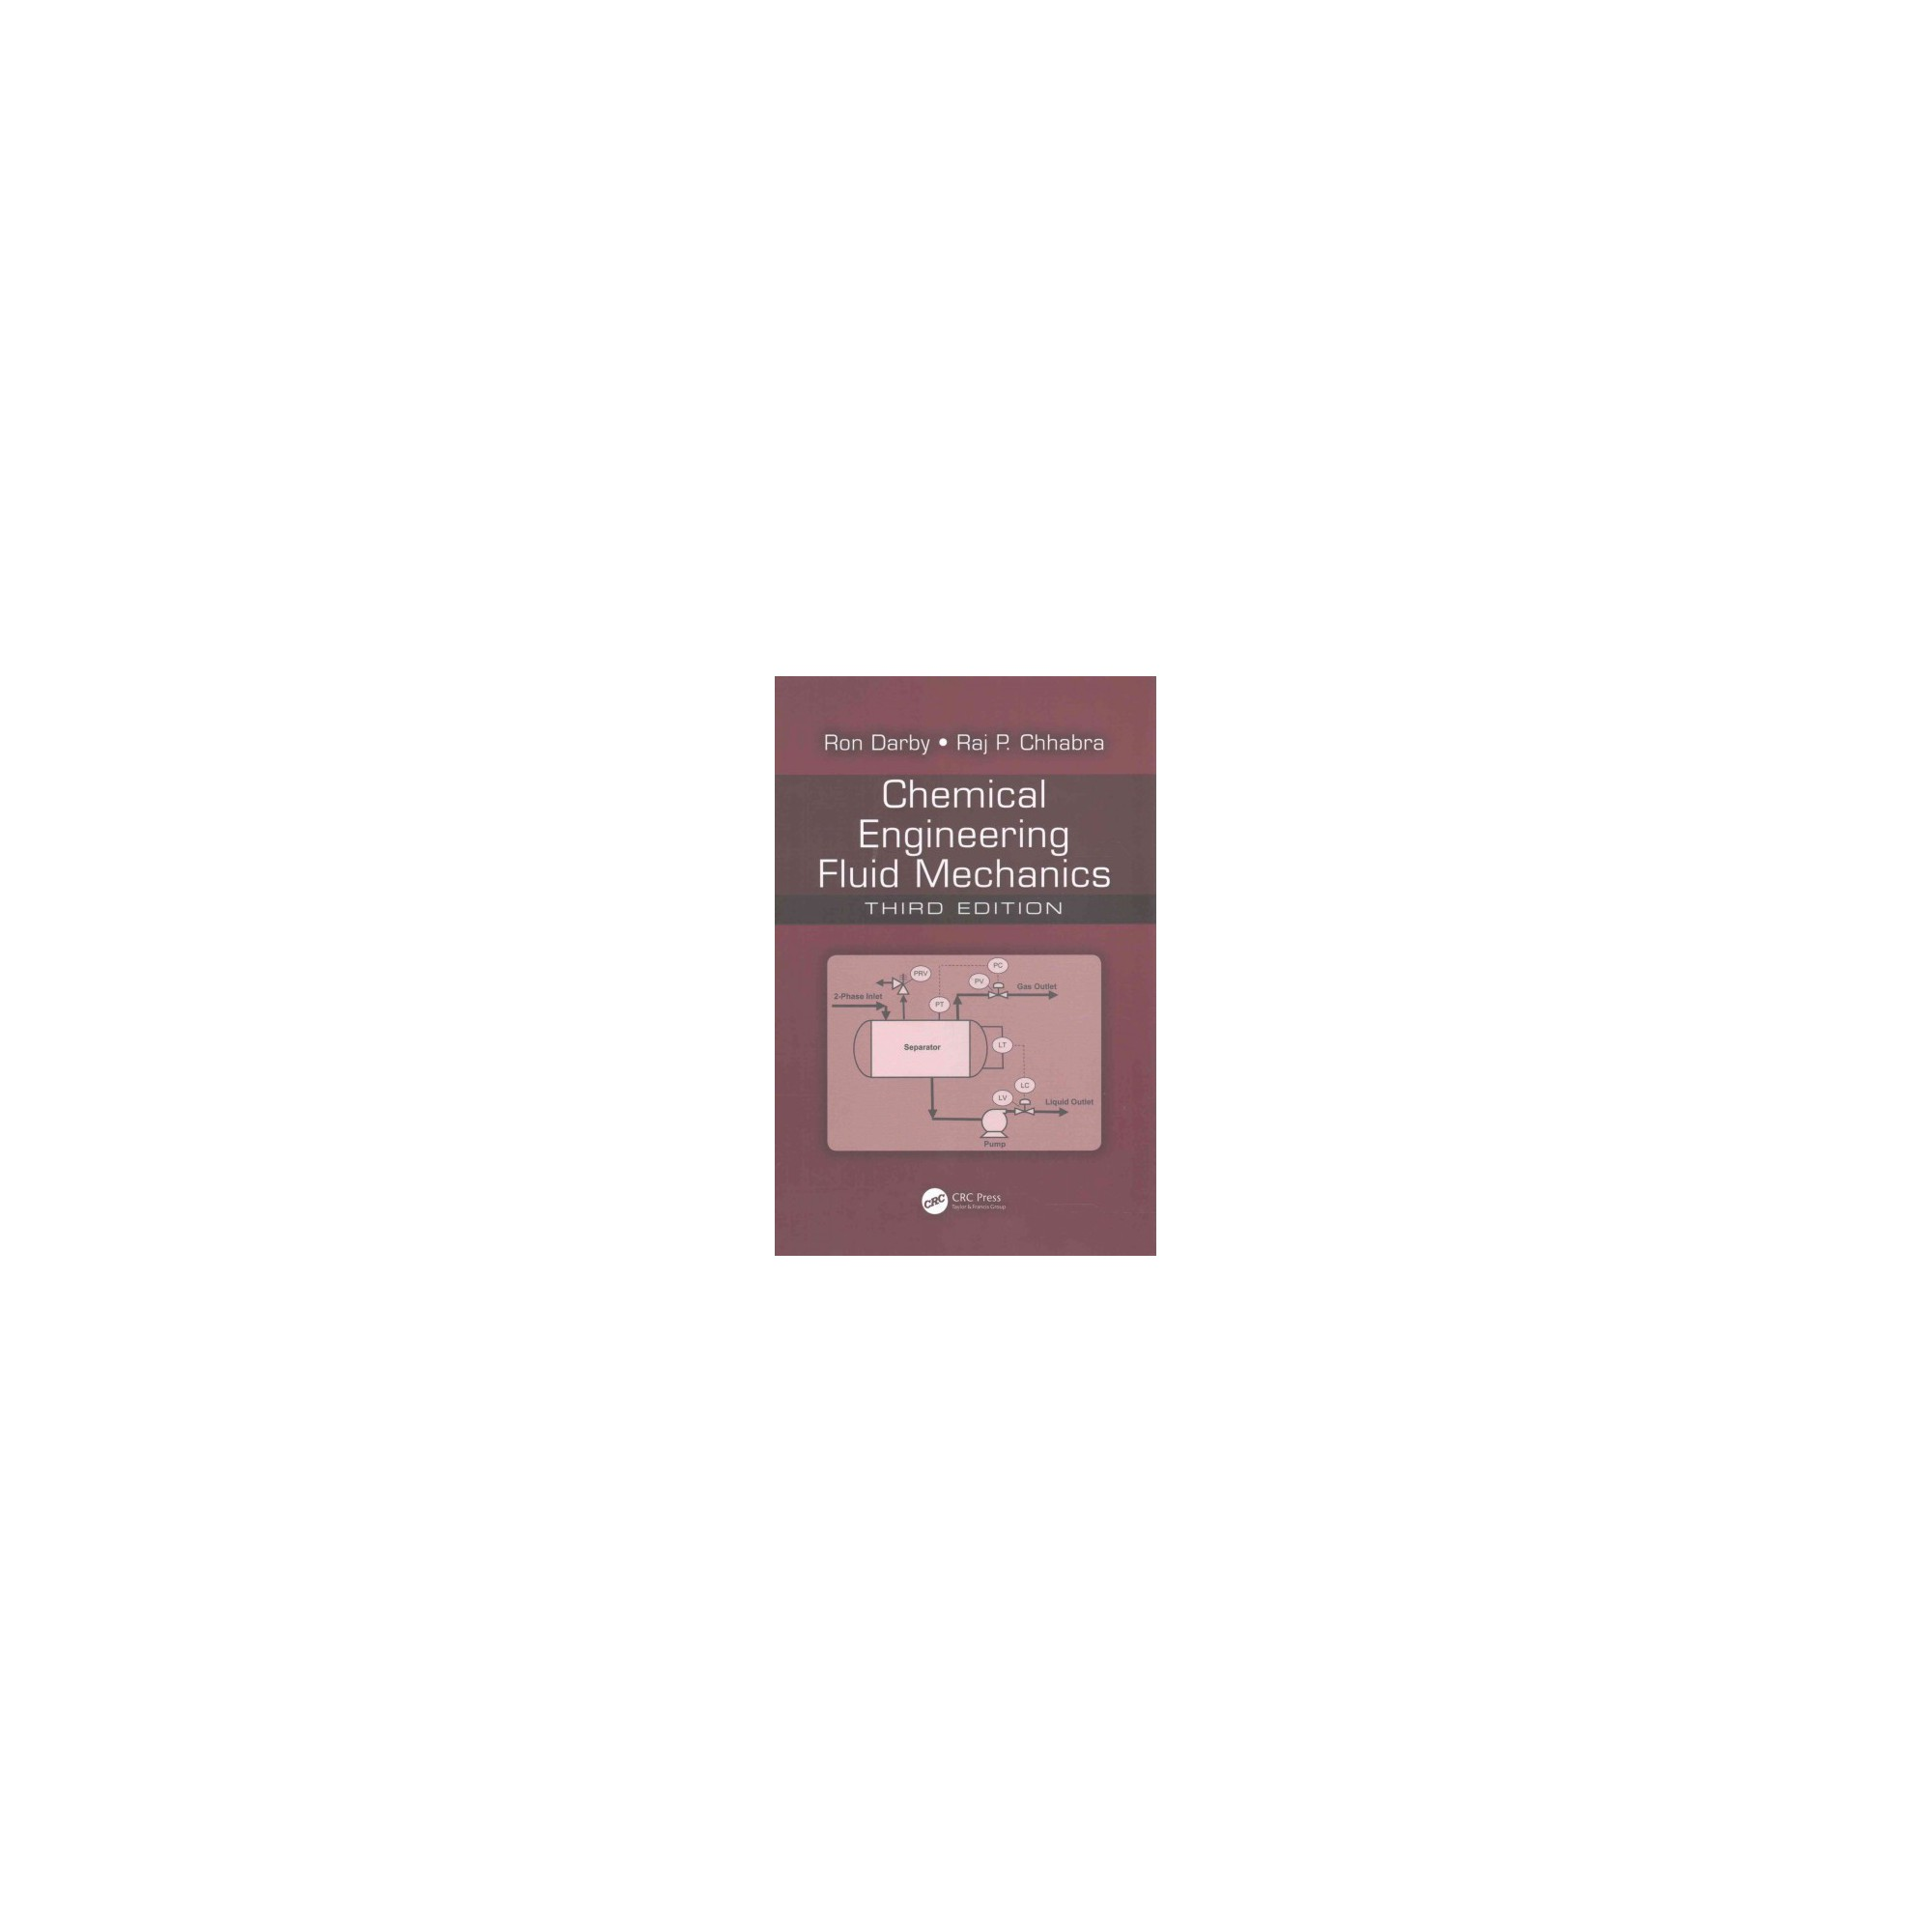 chemical engineering fluid mechanics hardcover ron darby raj p rh pinterest co uk